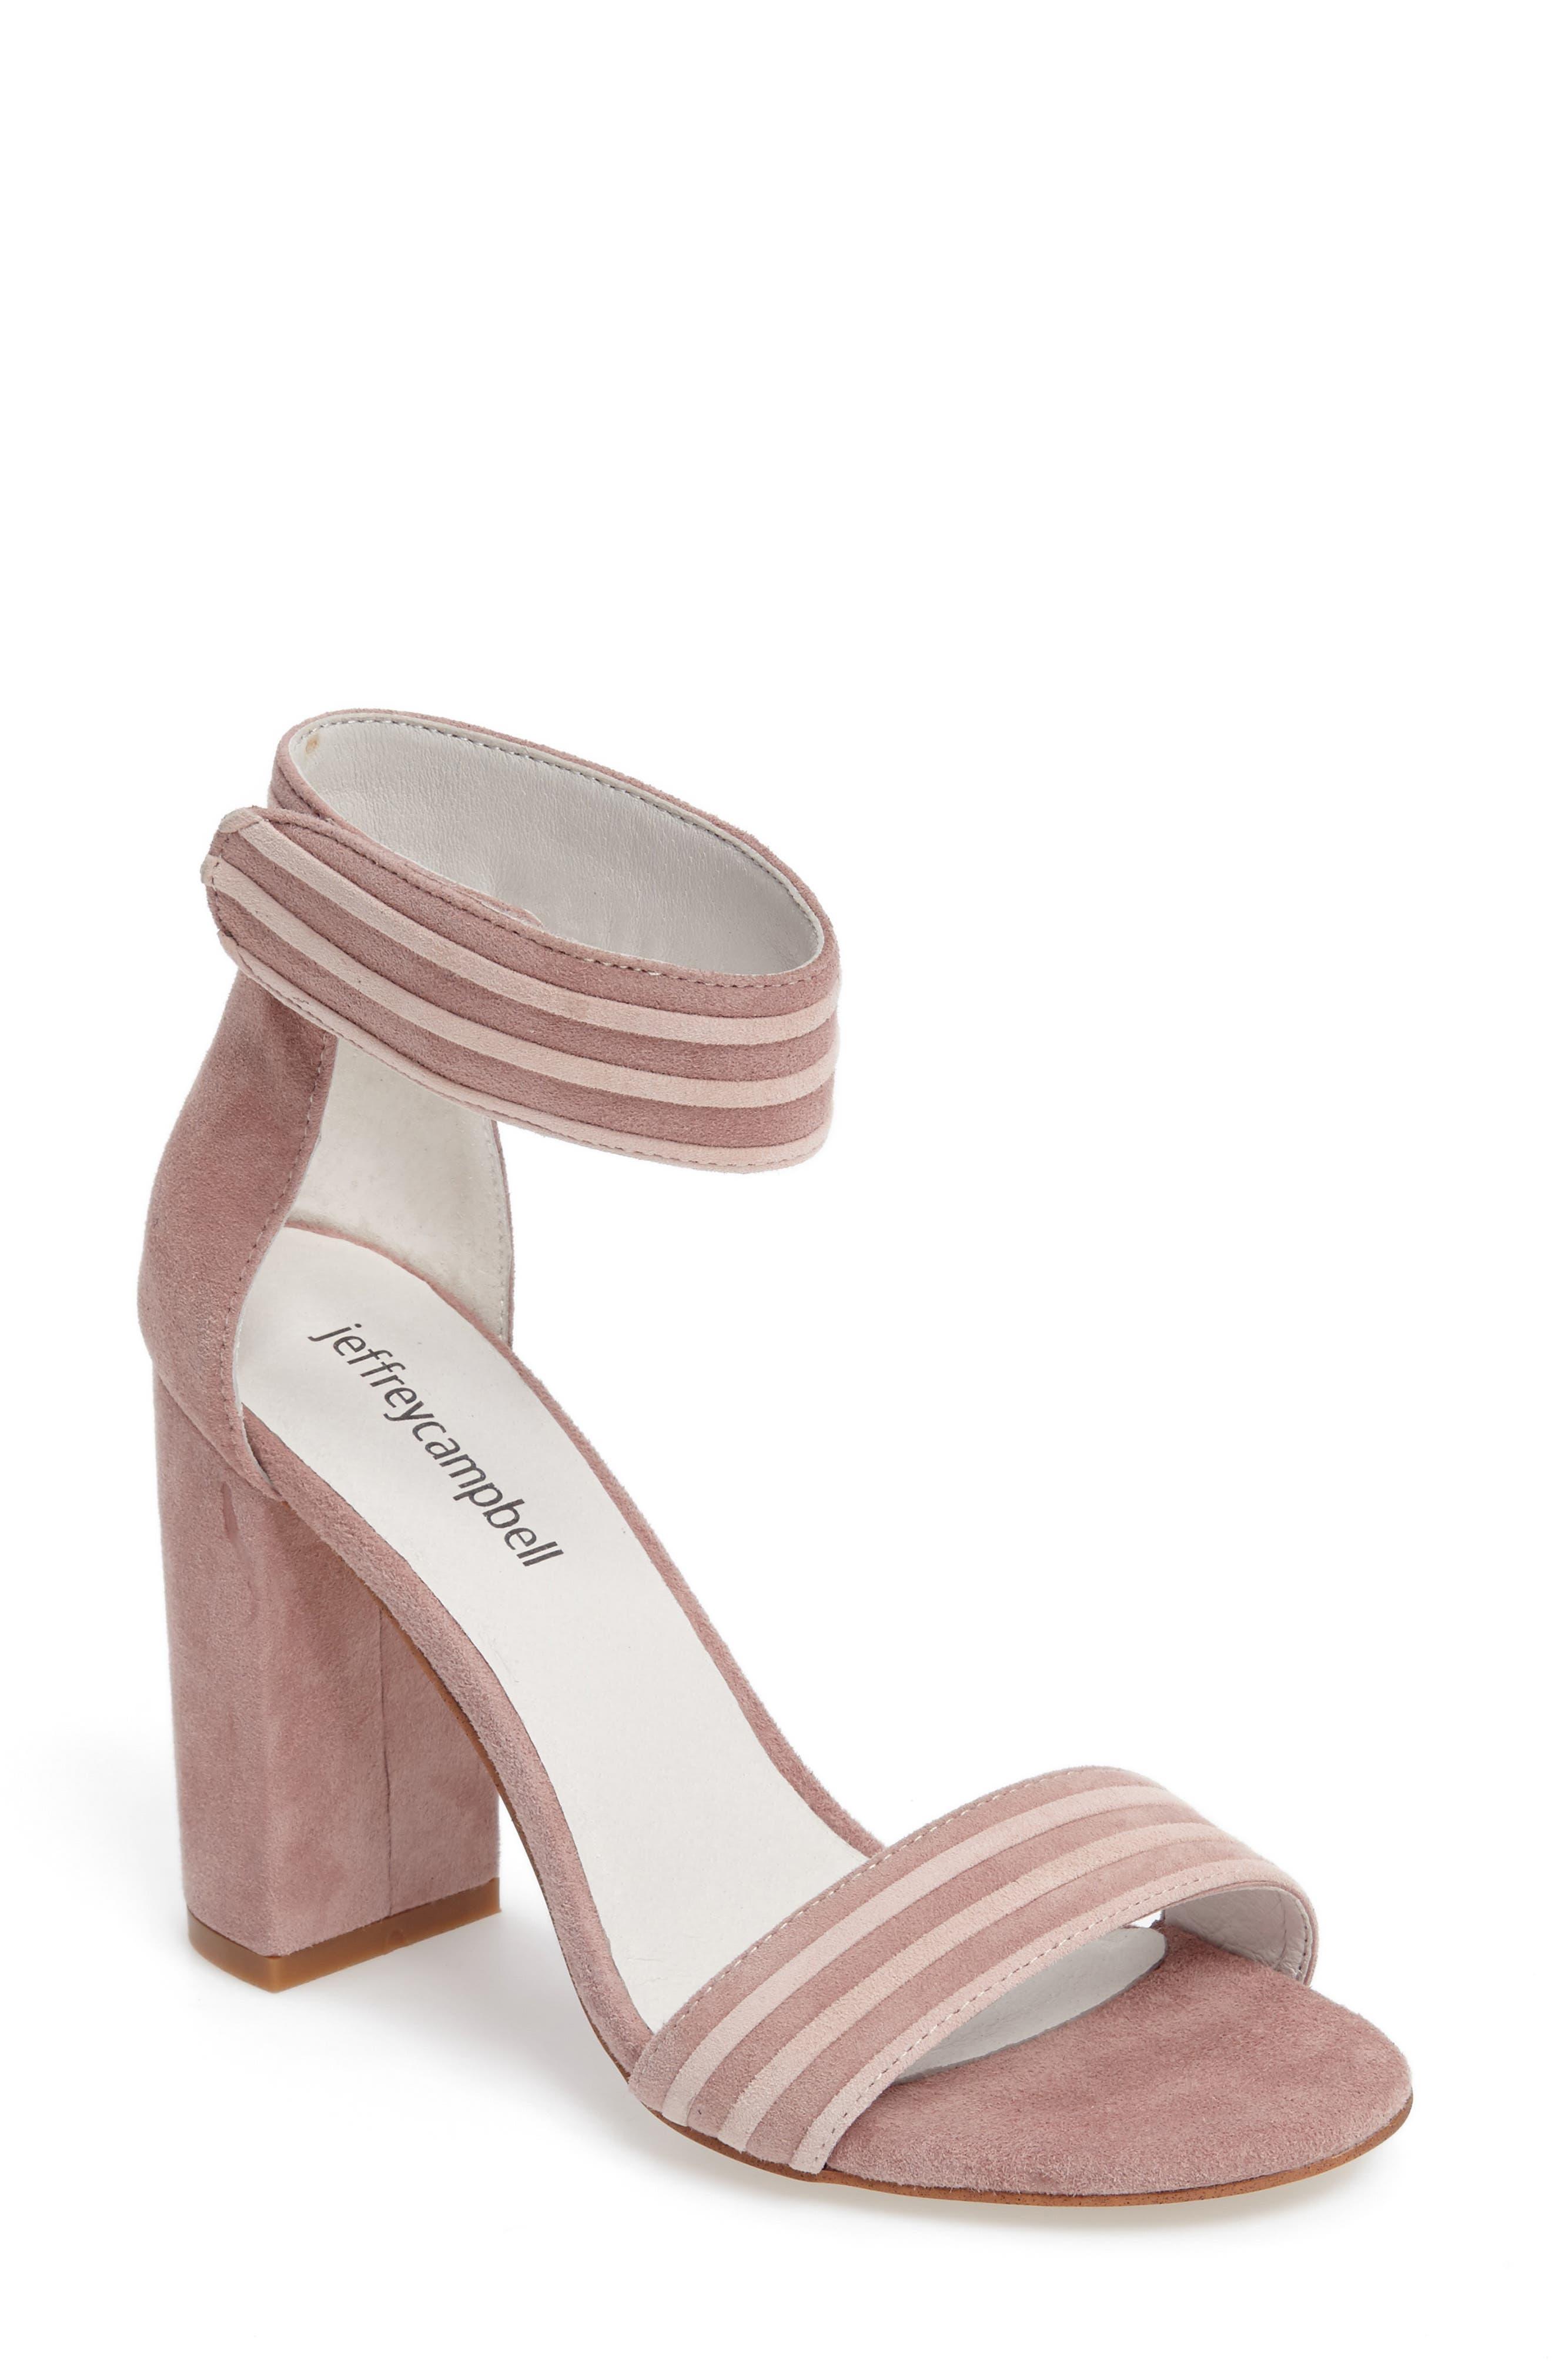 Main Image - Jeffrey Campbell Lindsay 2 Ankle Strap Sandal (Women)